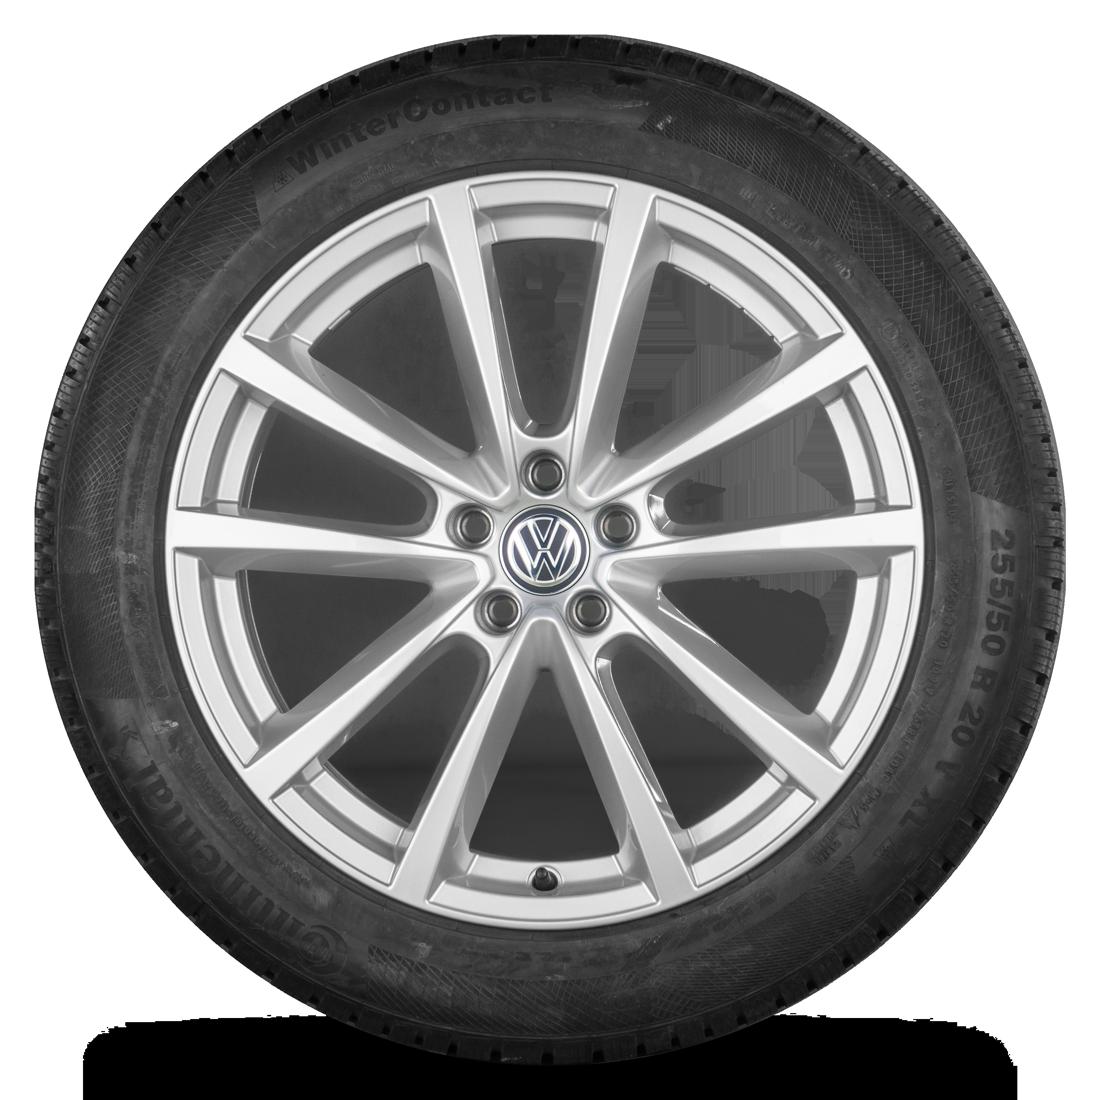 VW 20 Zoll Felgen Touareg 7P US Modell 5x112 Winterreifen Winterräder Neu